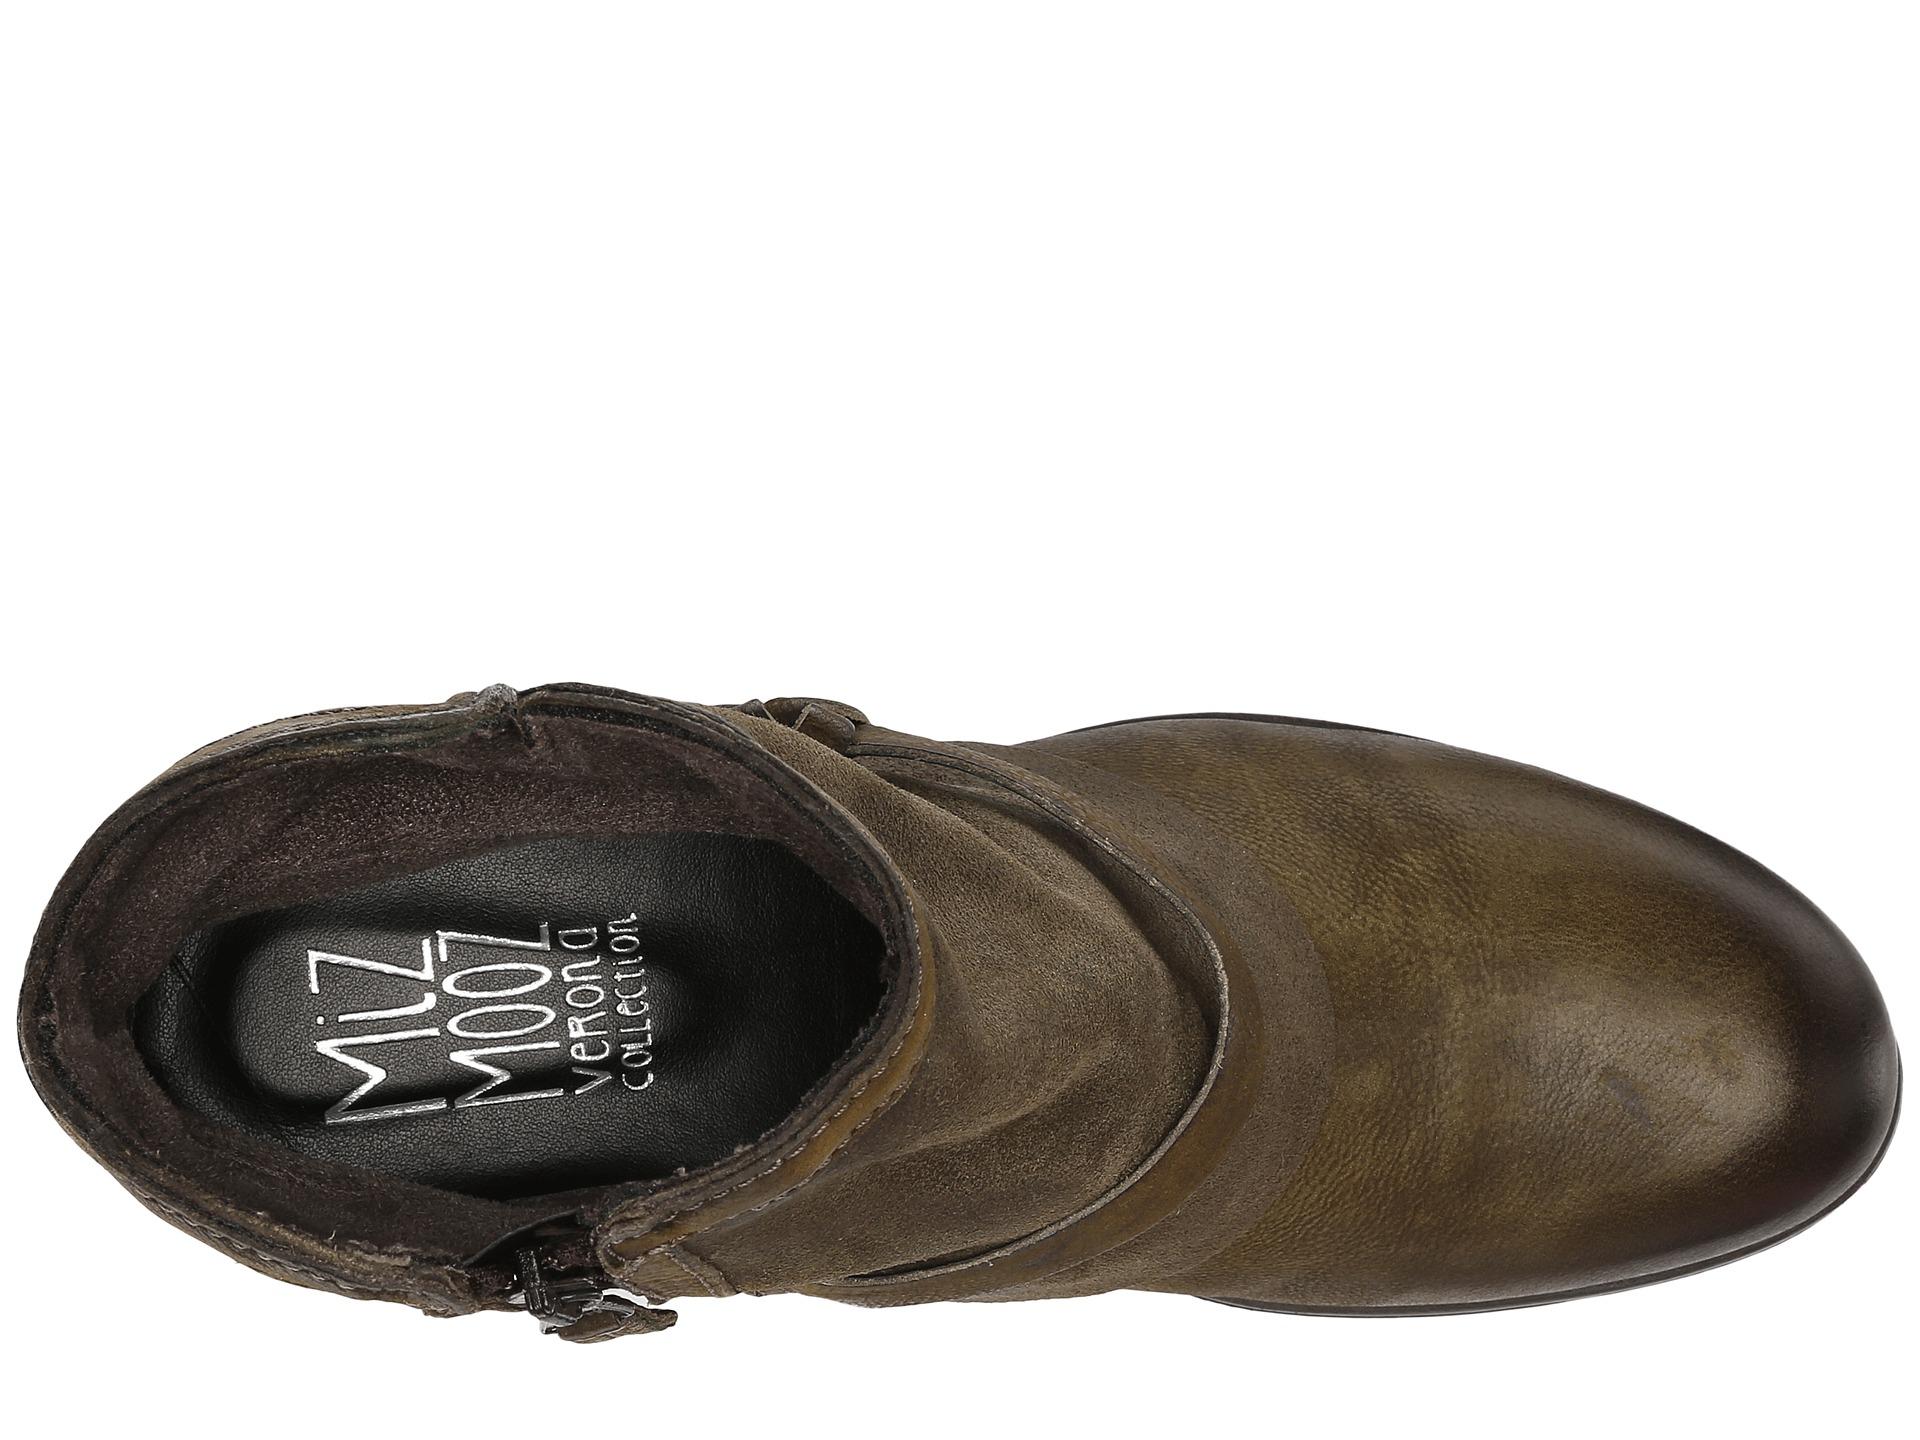 Report seymour boot